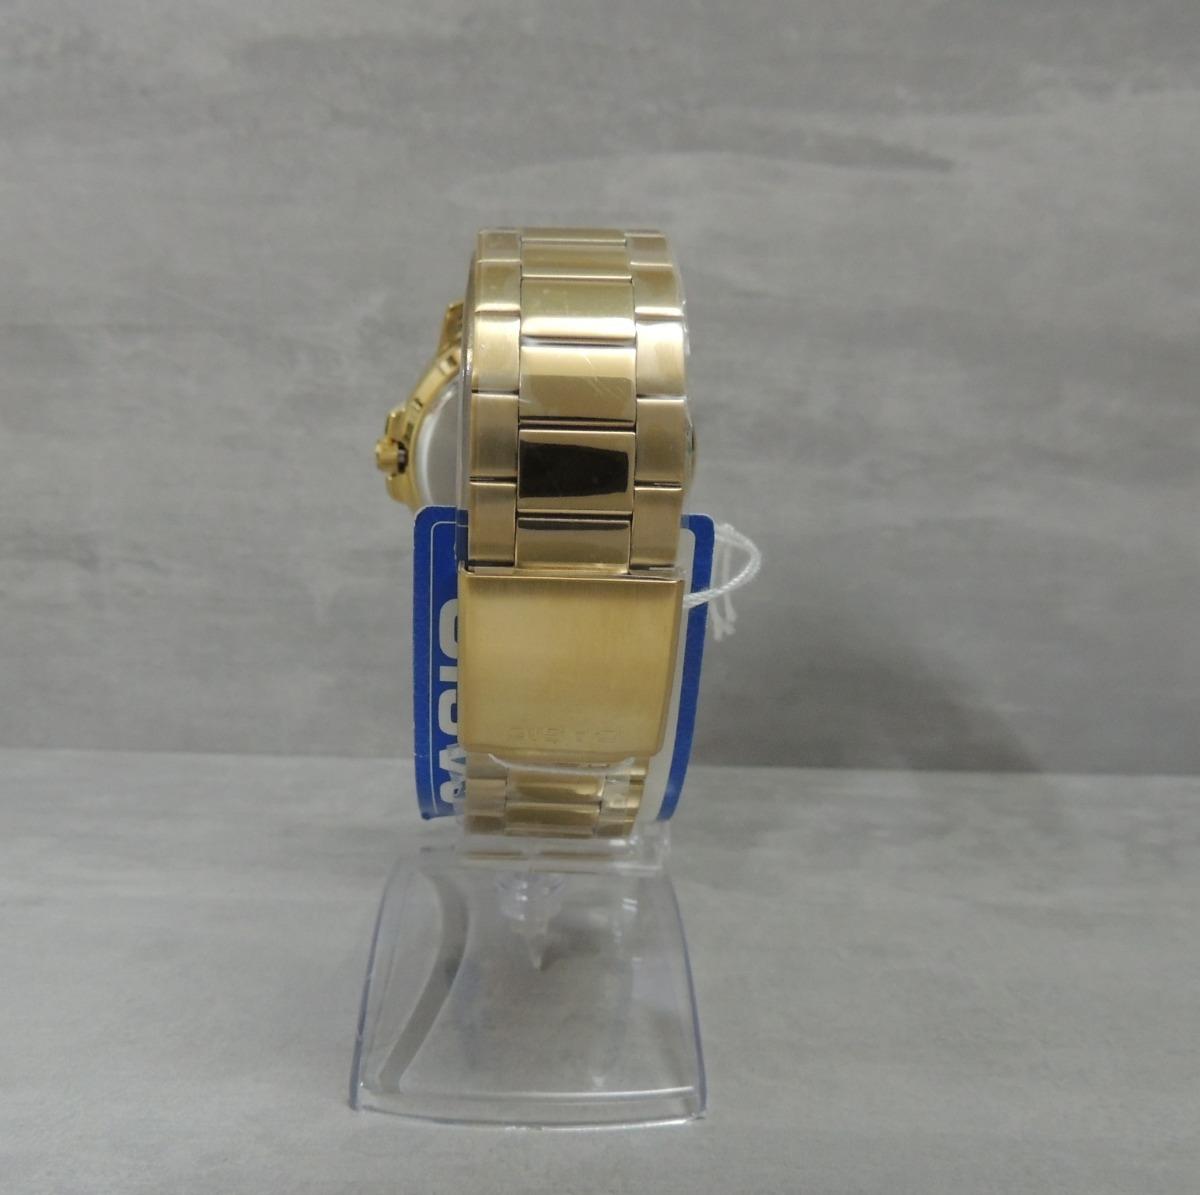 d59251bf0bd Lançamento Relógio Masculino Casio Mtp-vd01g-9evudf (nf) - R  194